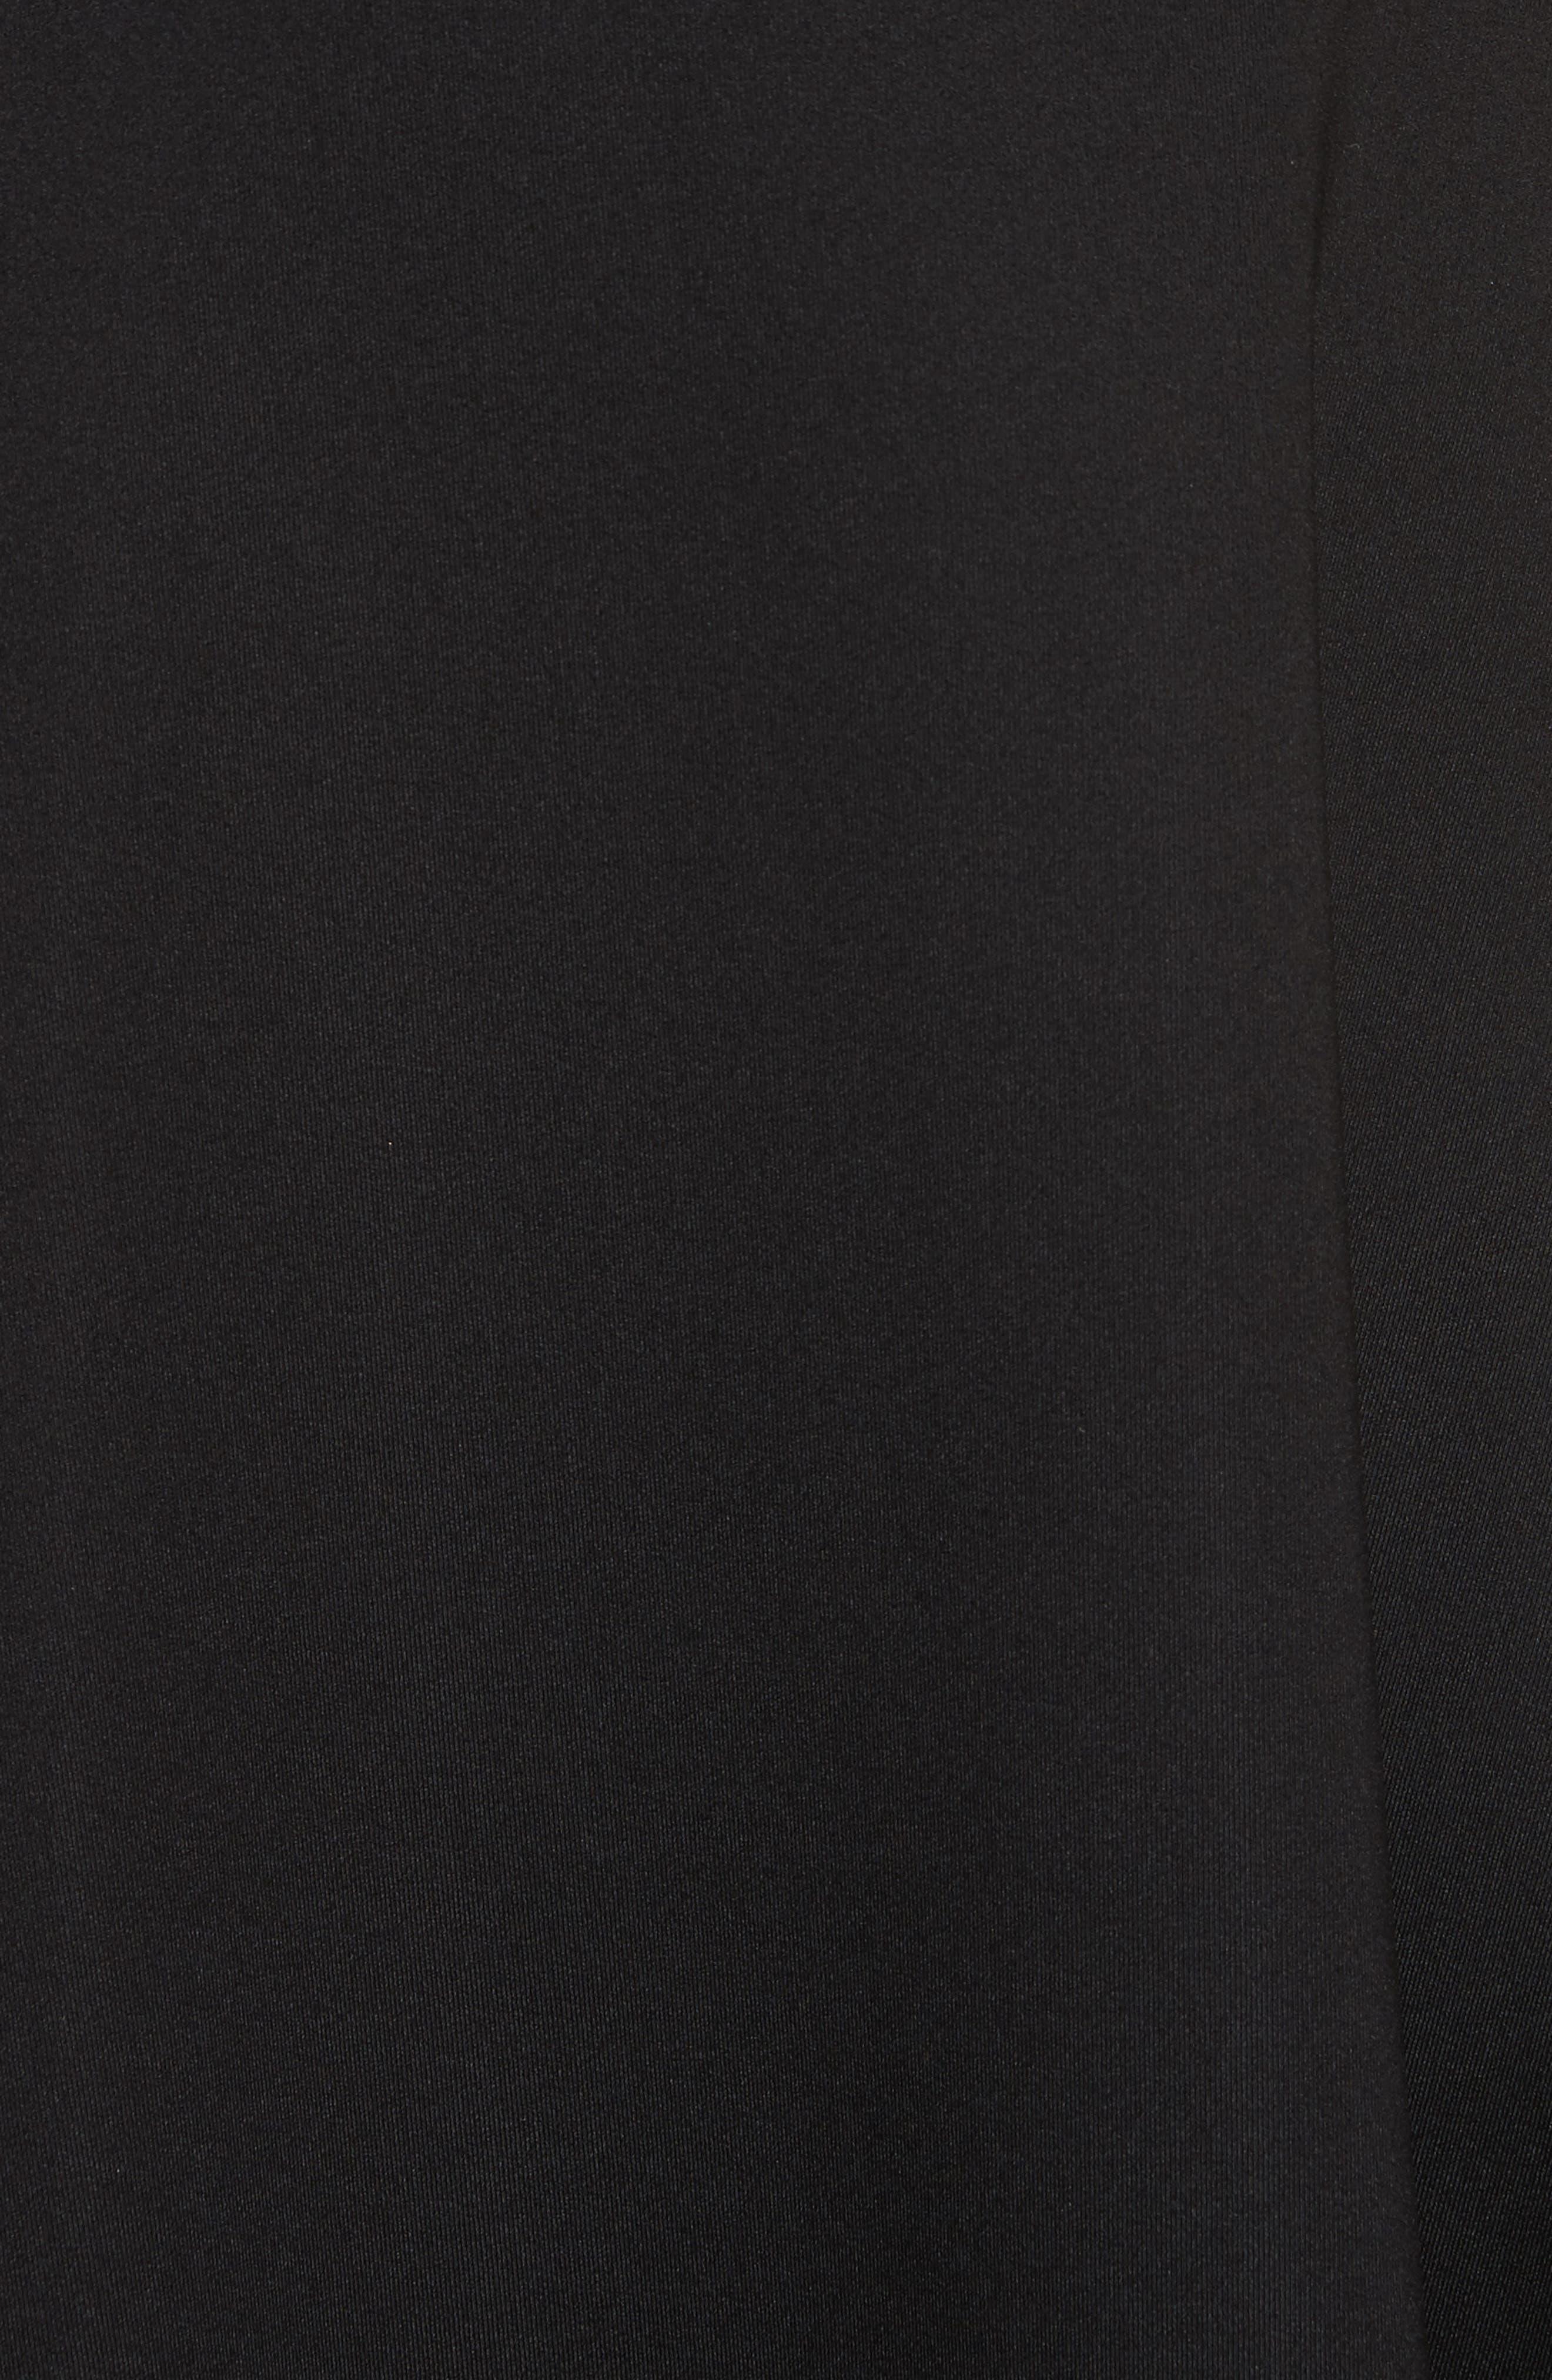 Harlock Fit & Flare Dress,                             Alternate thumbnail 5, color,                             Black